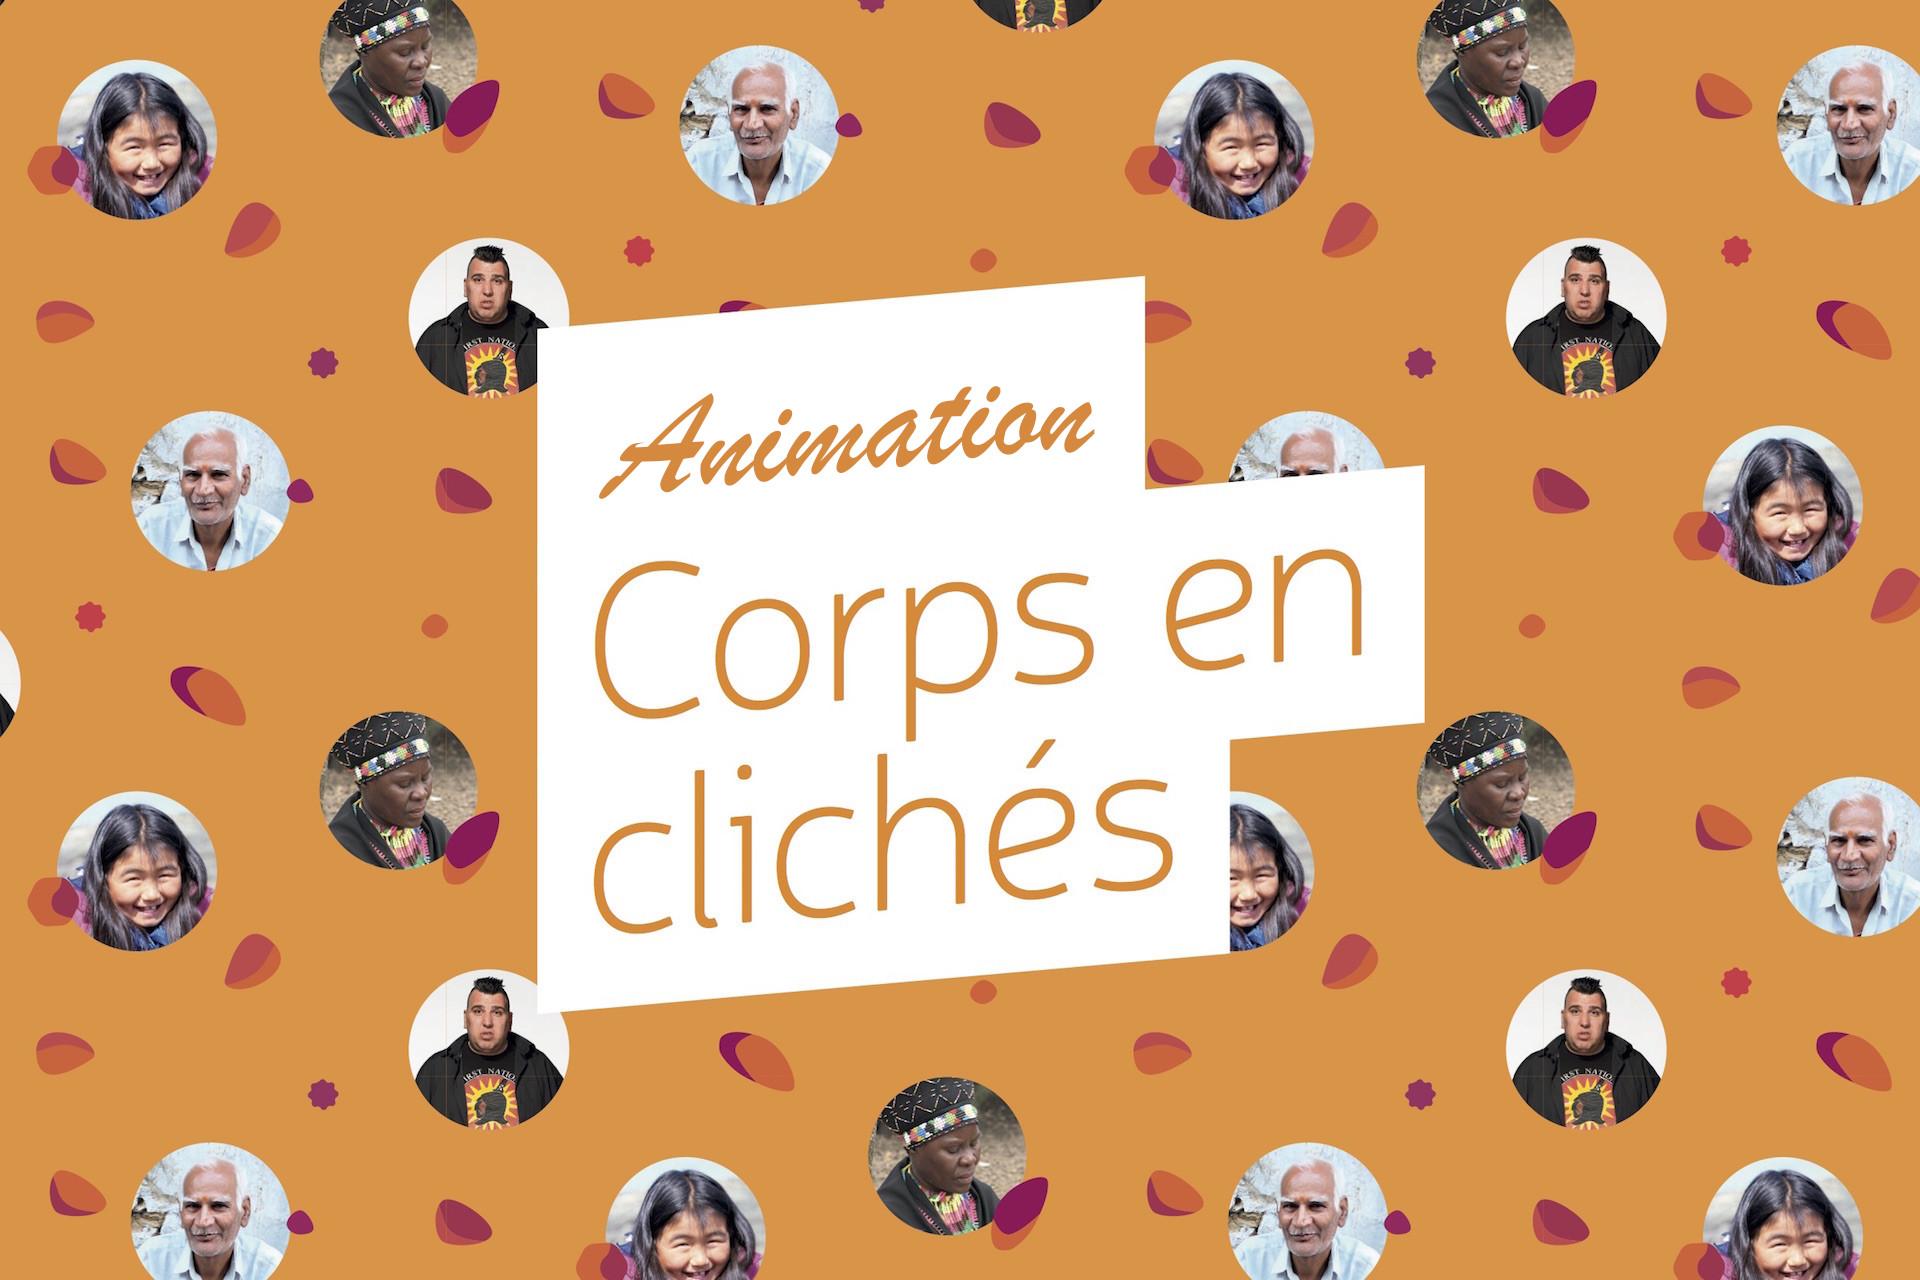 belgik-mojaik-animation-jeunes-corps-en-cliches>